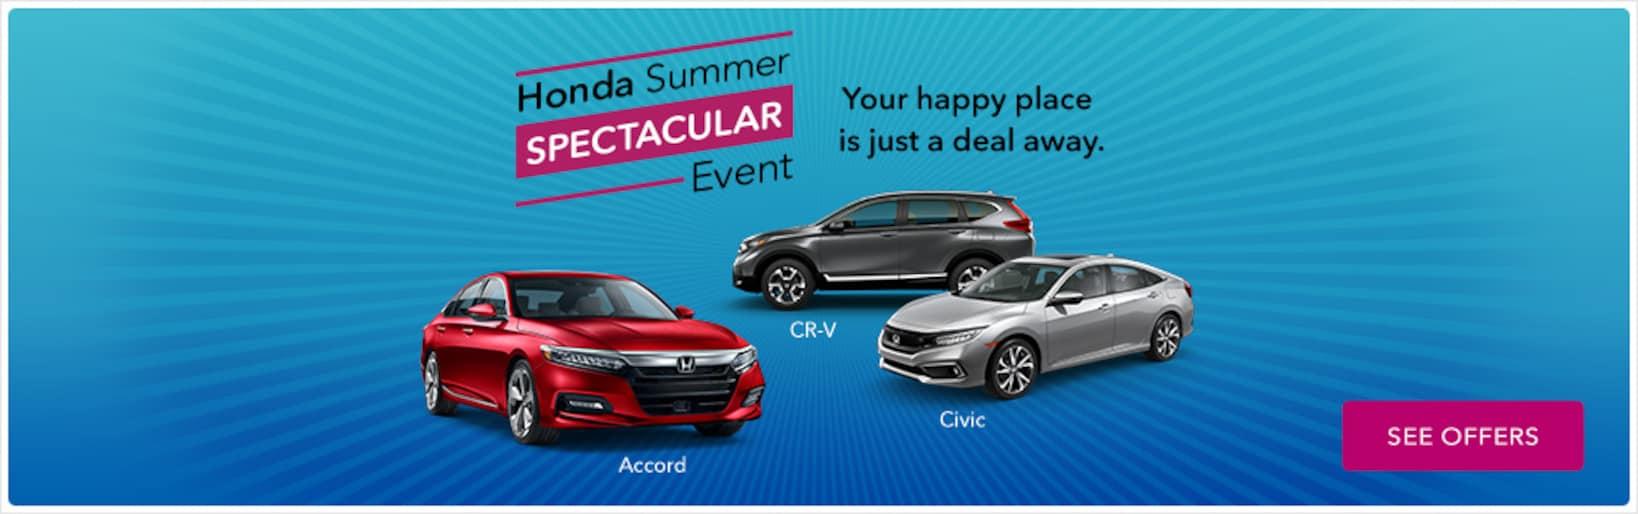 Honda Dealership Louisville Ky >> Jeff Wyler Dixie Honda New And Used Honda Dealer In Louisville